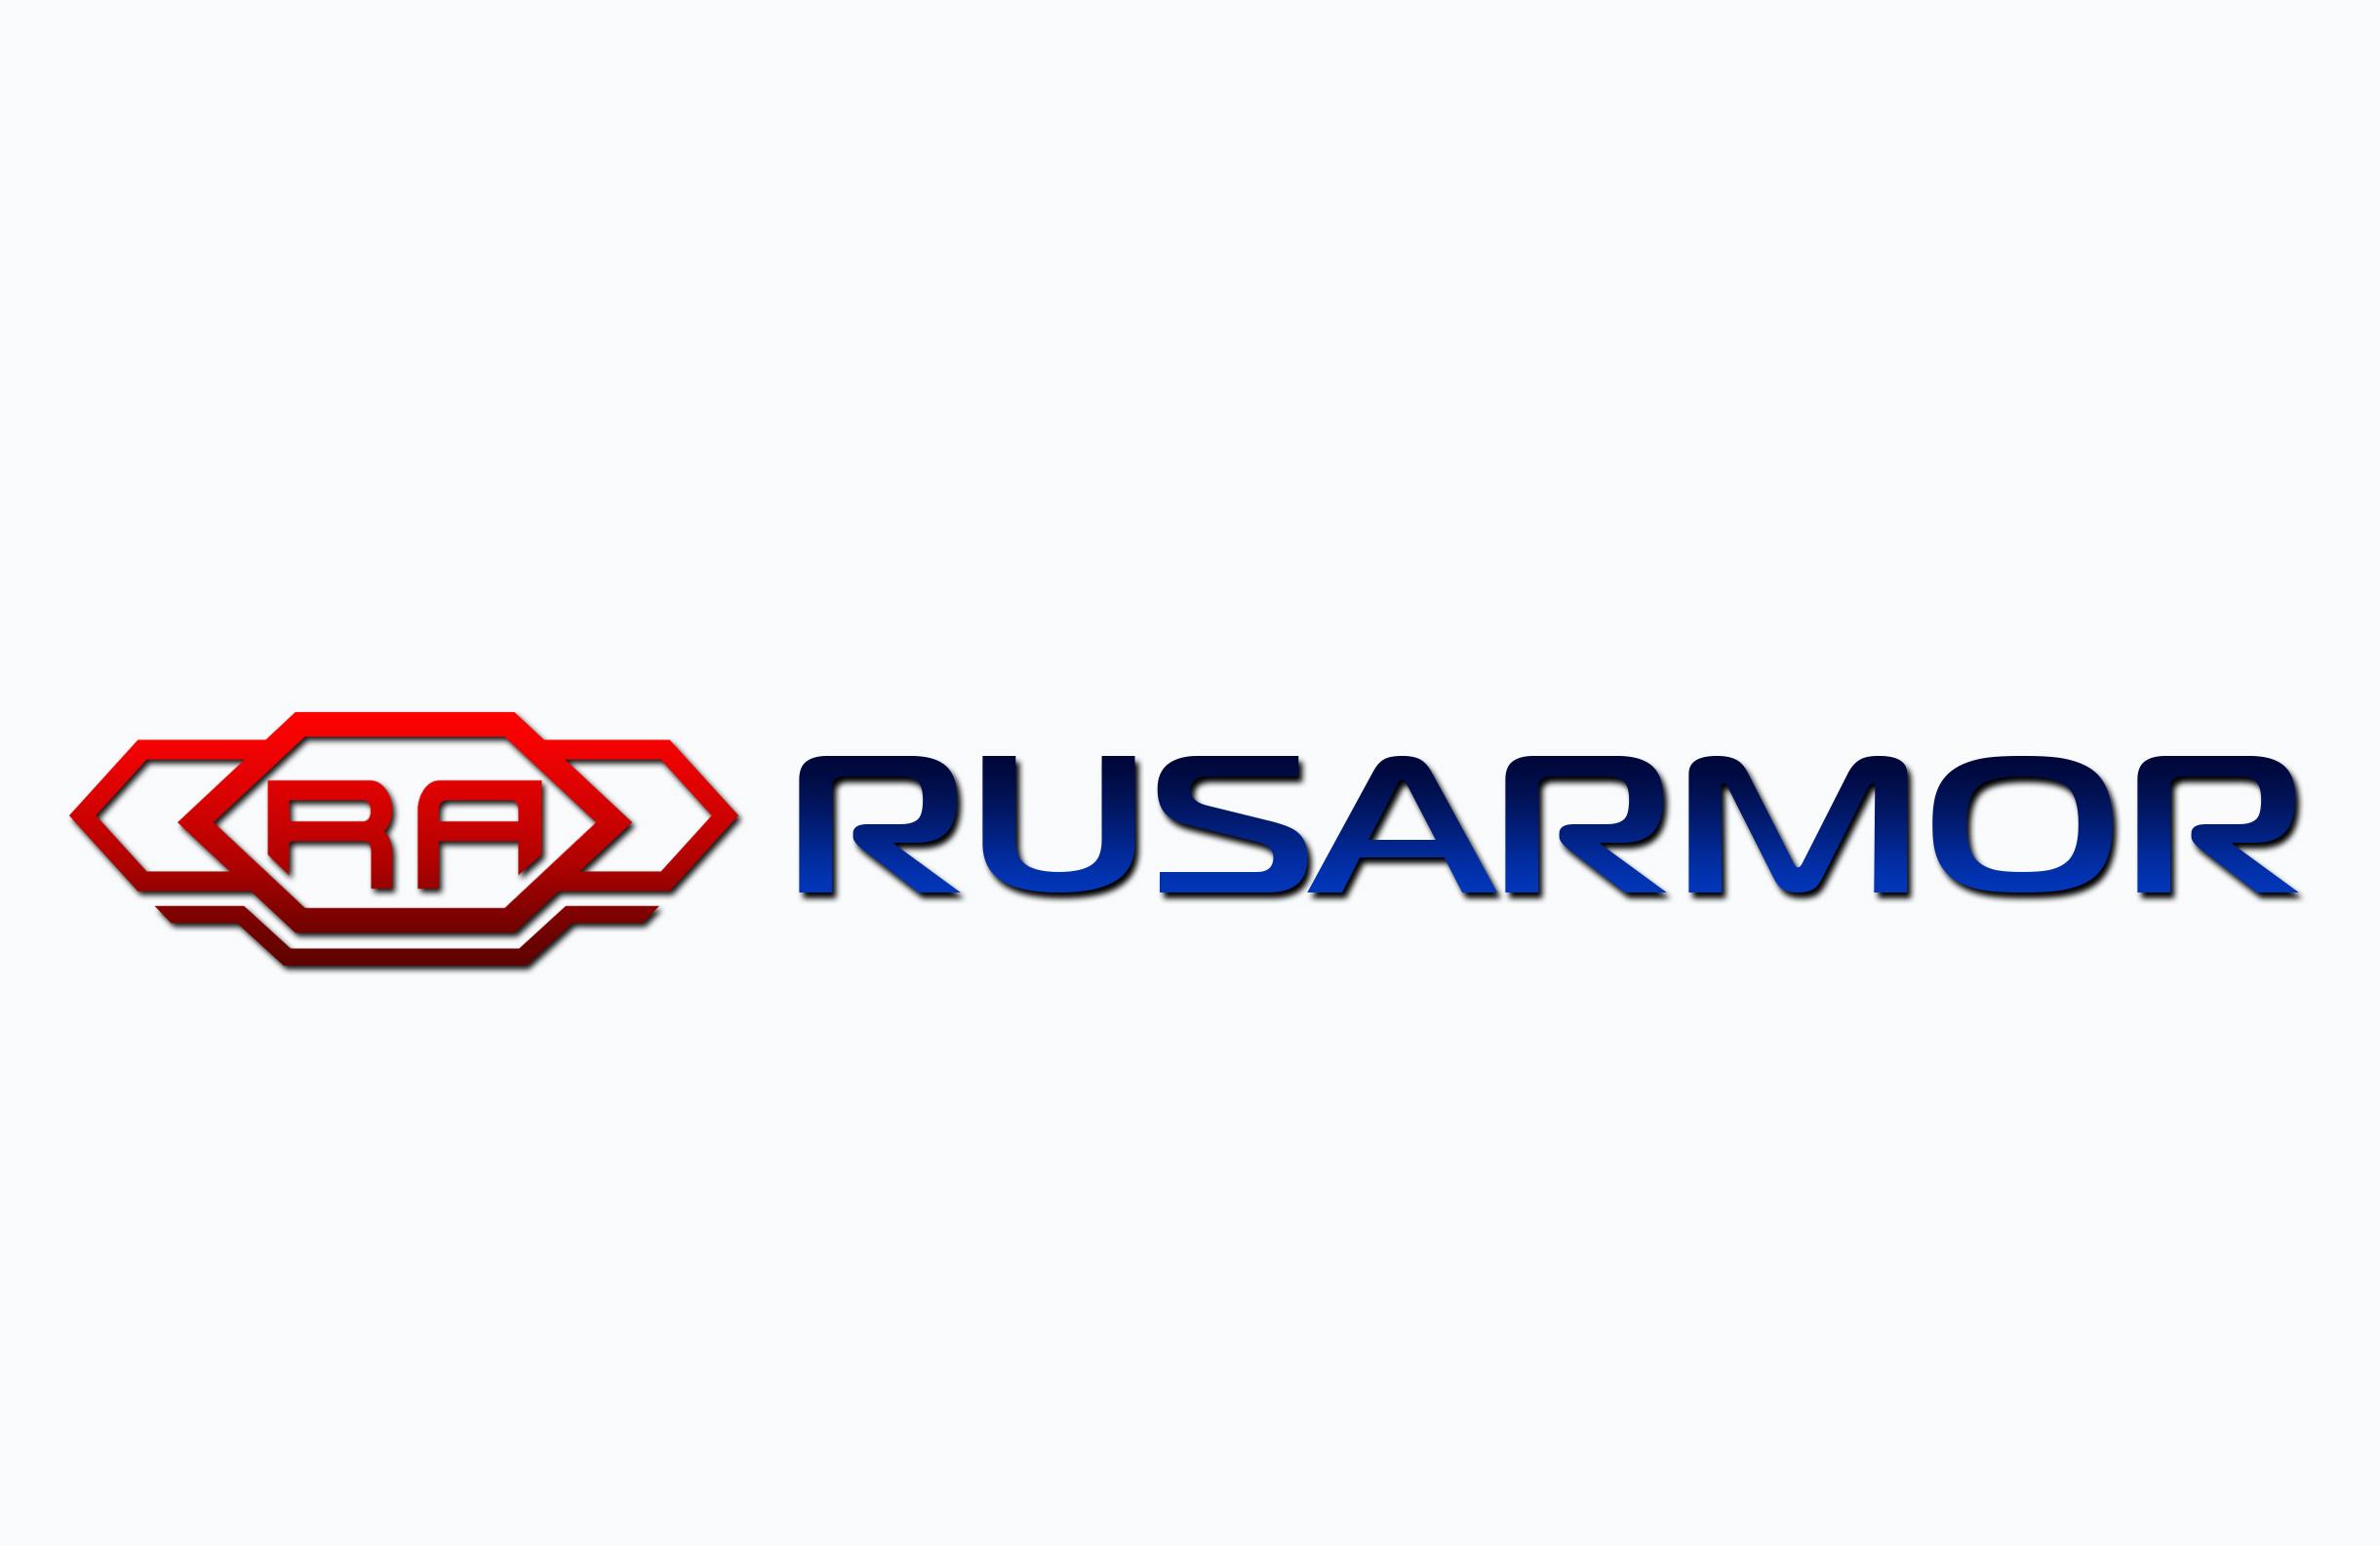 Разработка логотипа технологического стартапа РУСАРМОР фото f_6415a0f47919026b.jpg